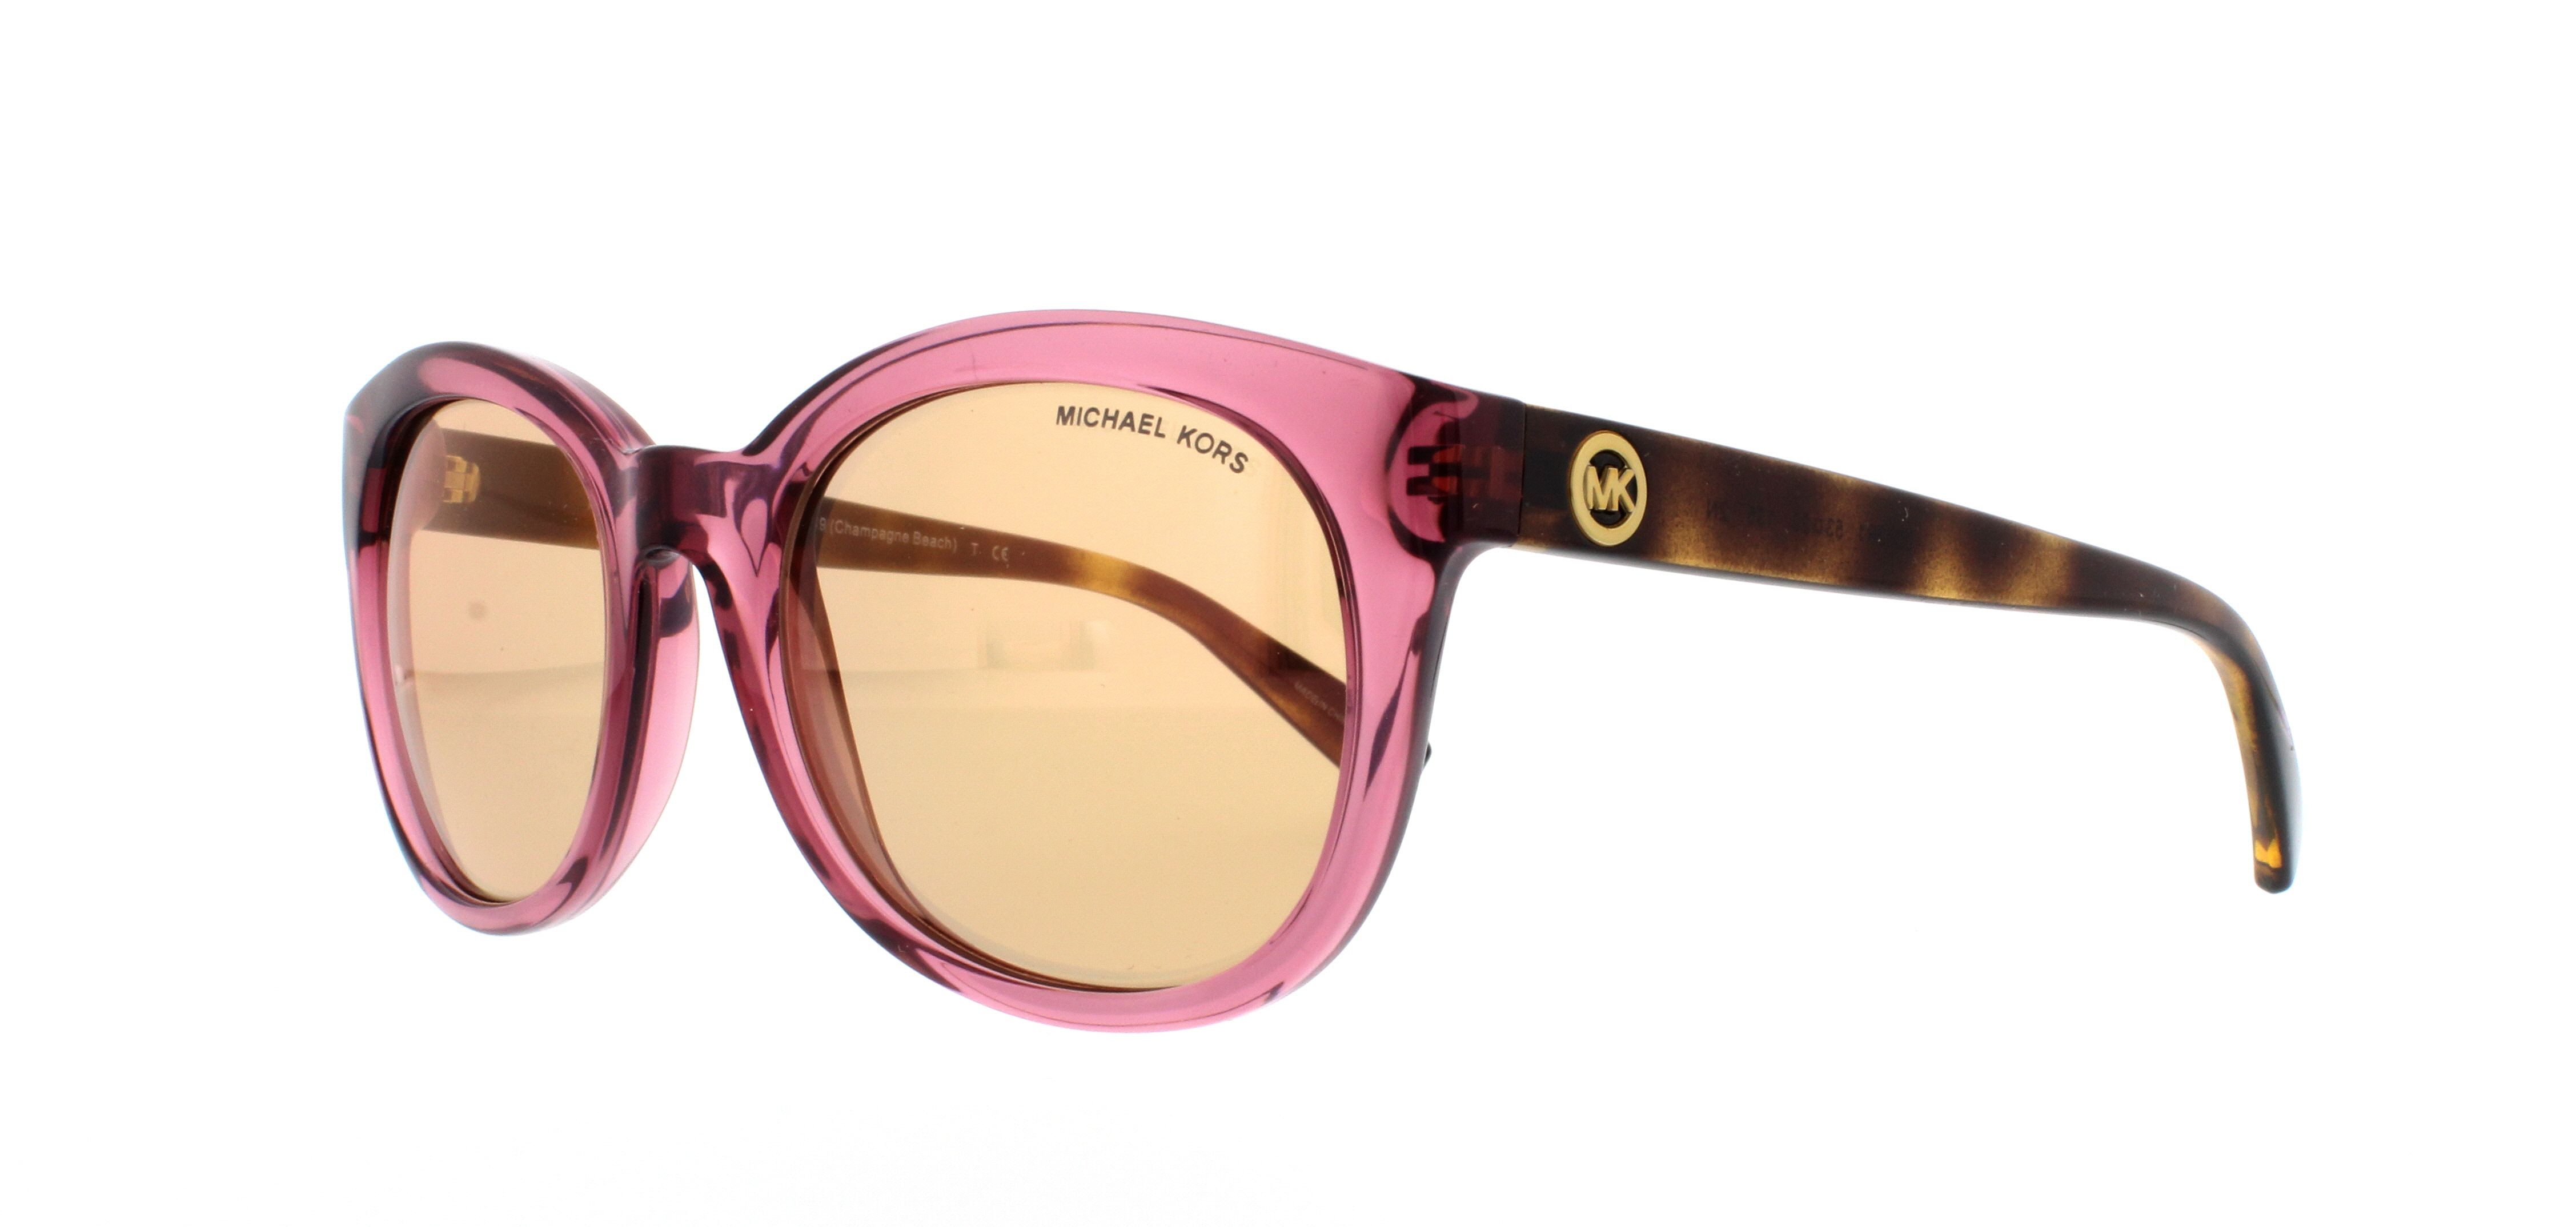 2ee5957bb5a65 Designer Frames Outlet. Michael Kors MK6019 Champagne Beach